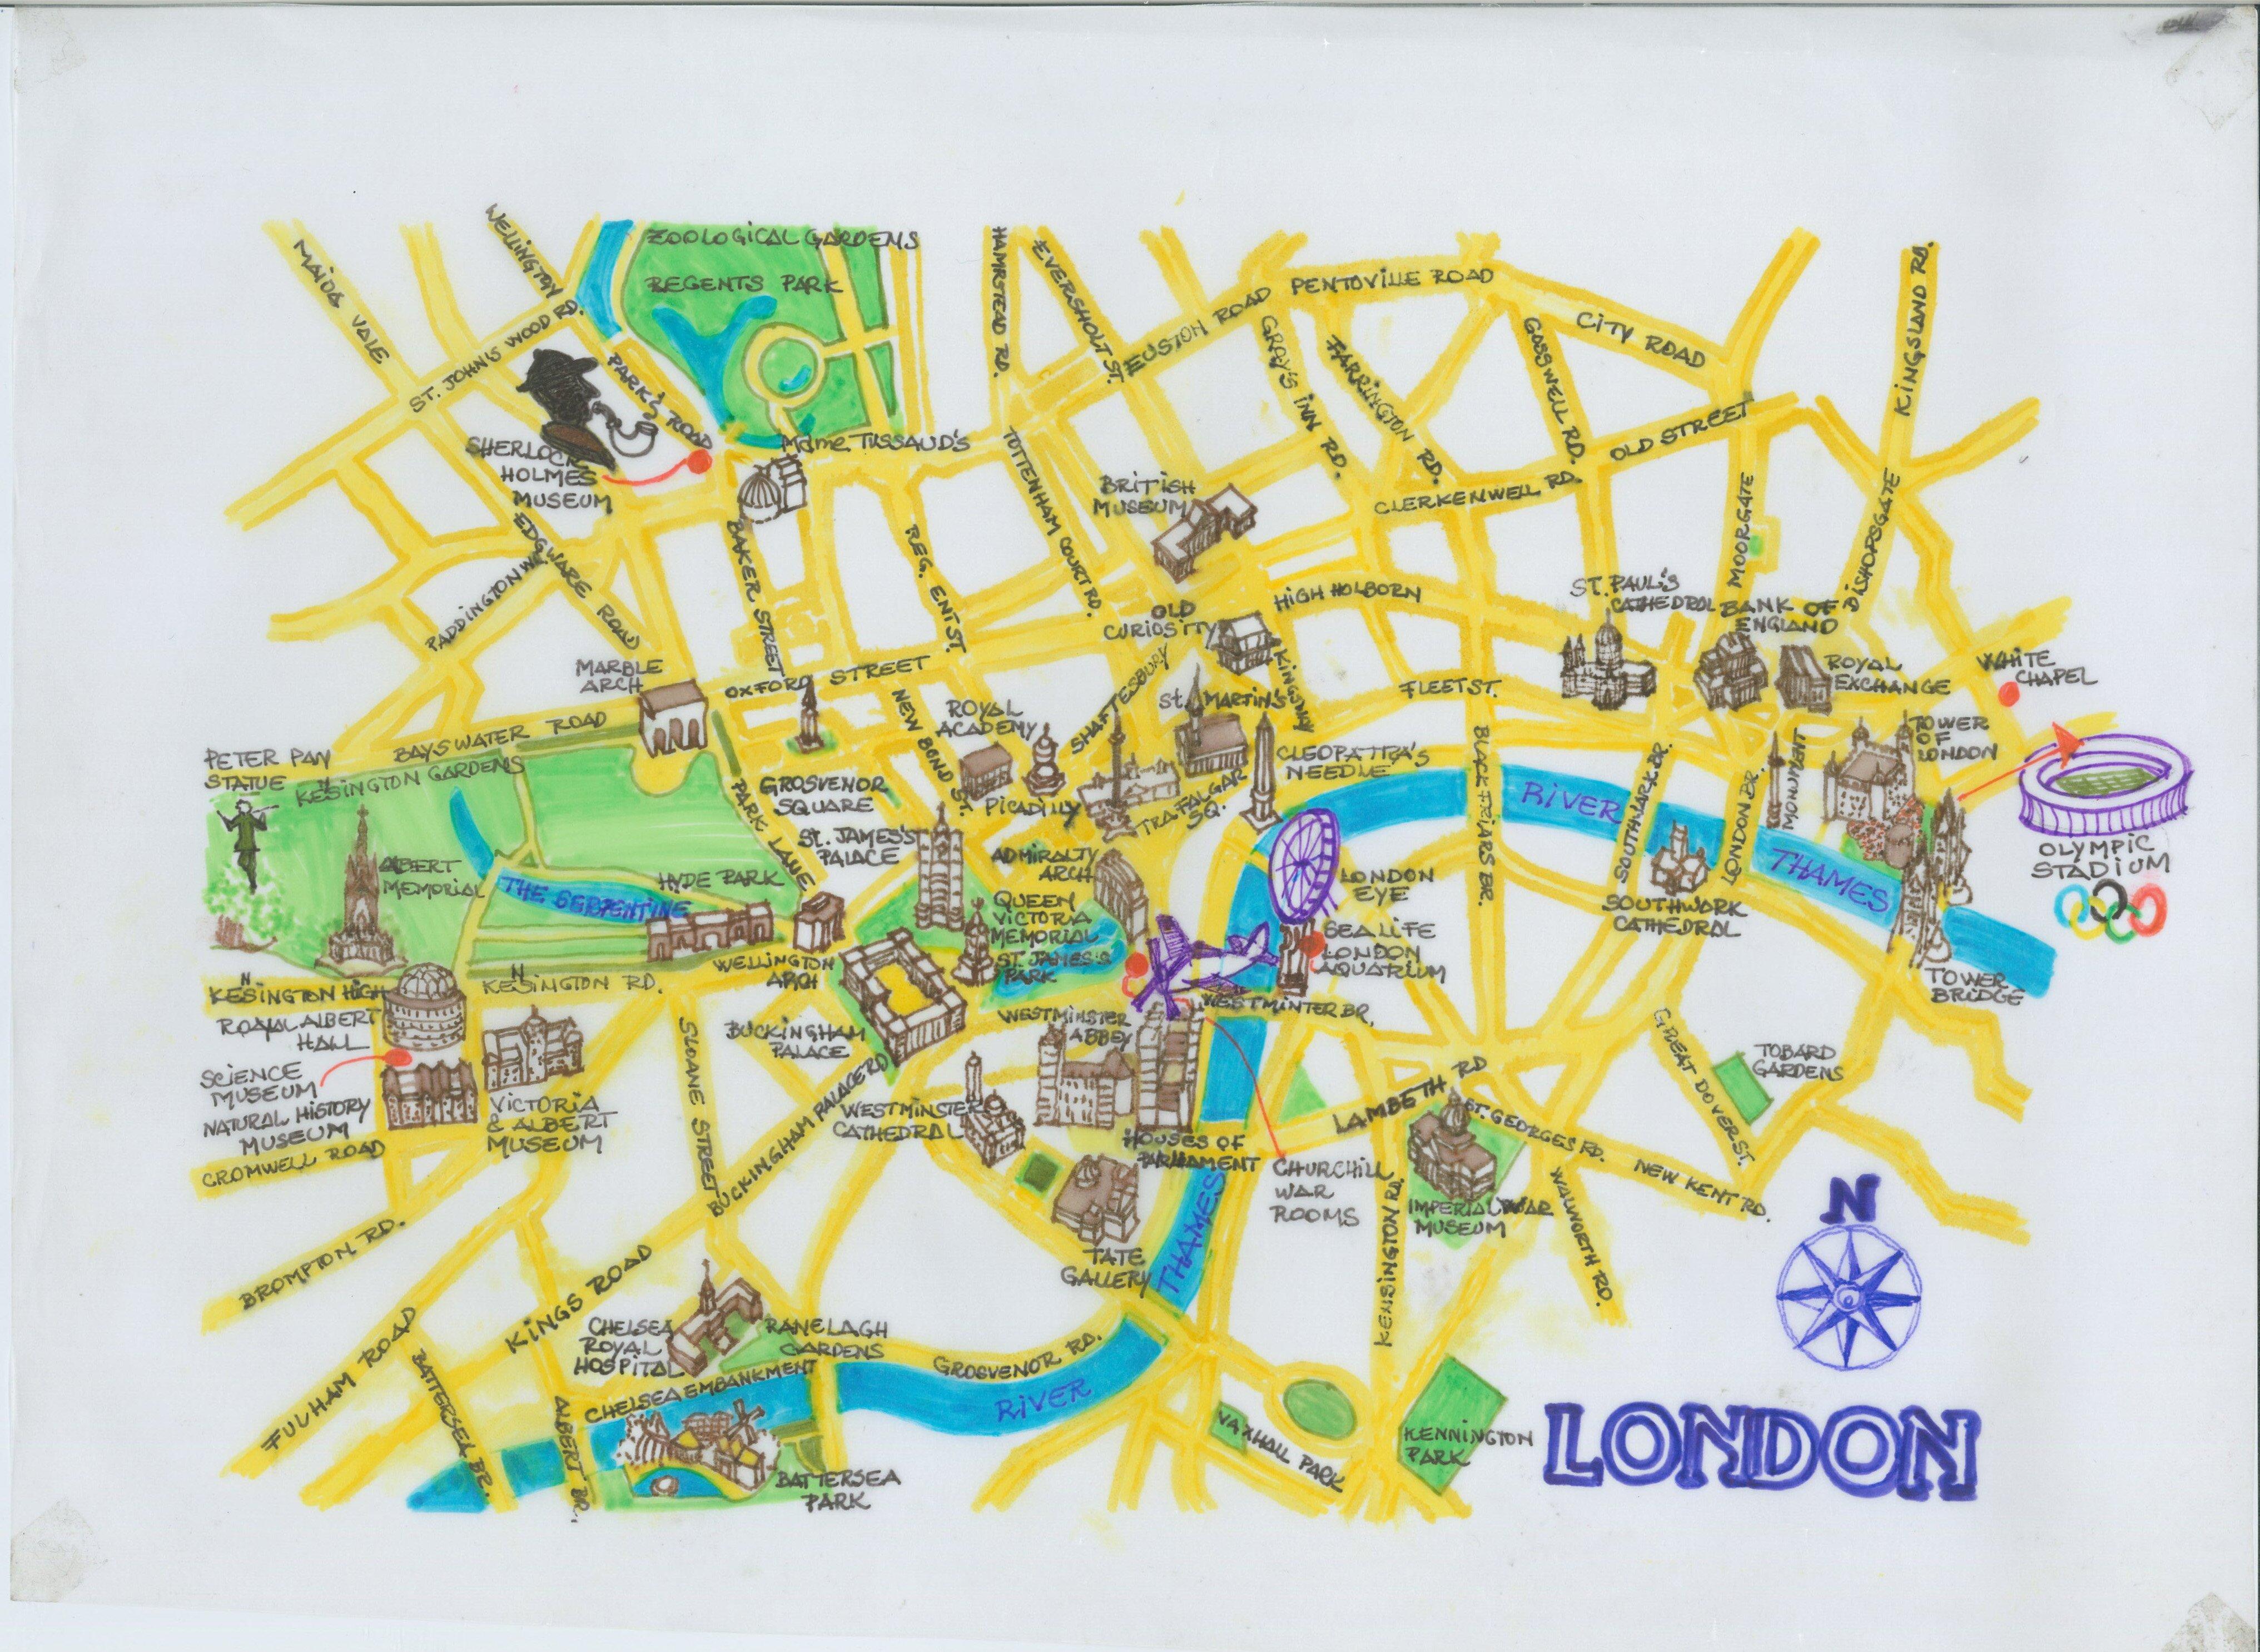 MAPA TURISTICO LONDRES PDF DOWNLOAD